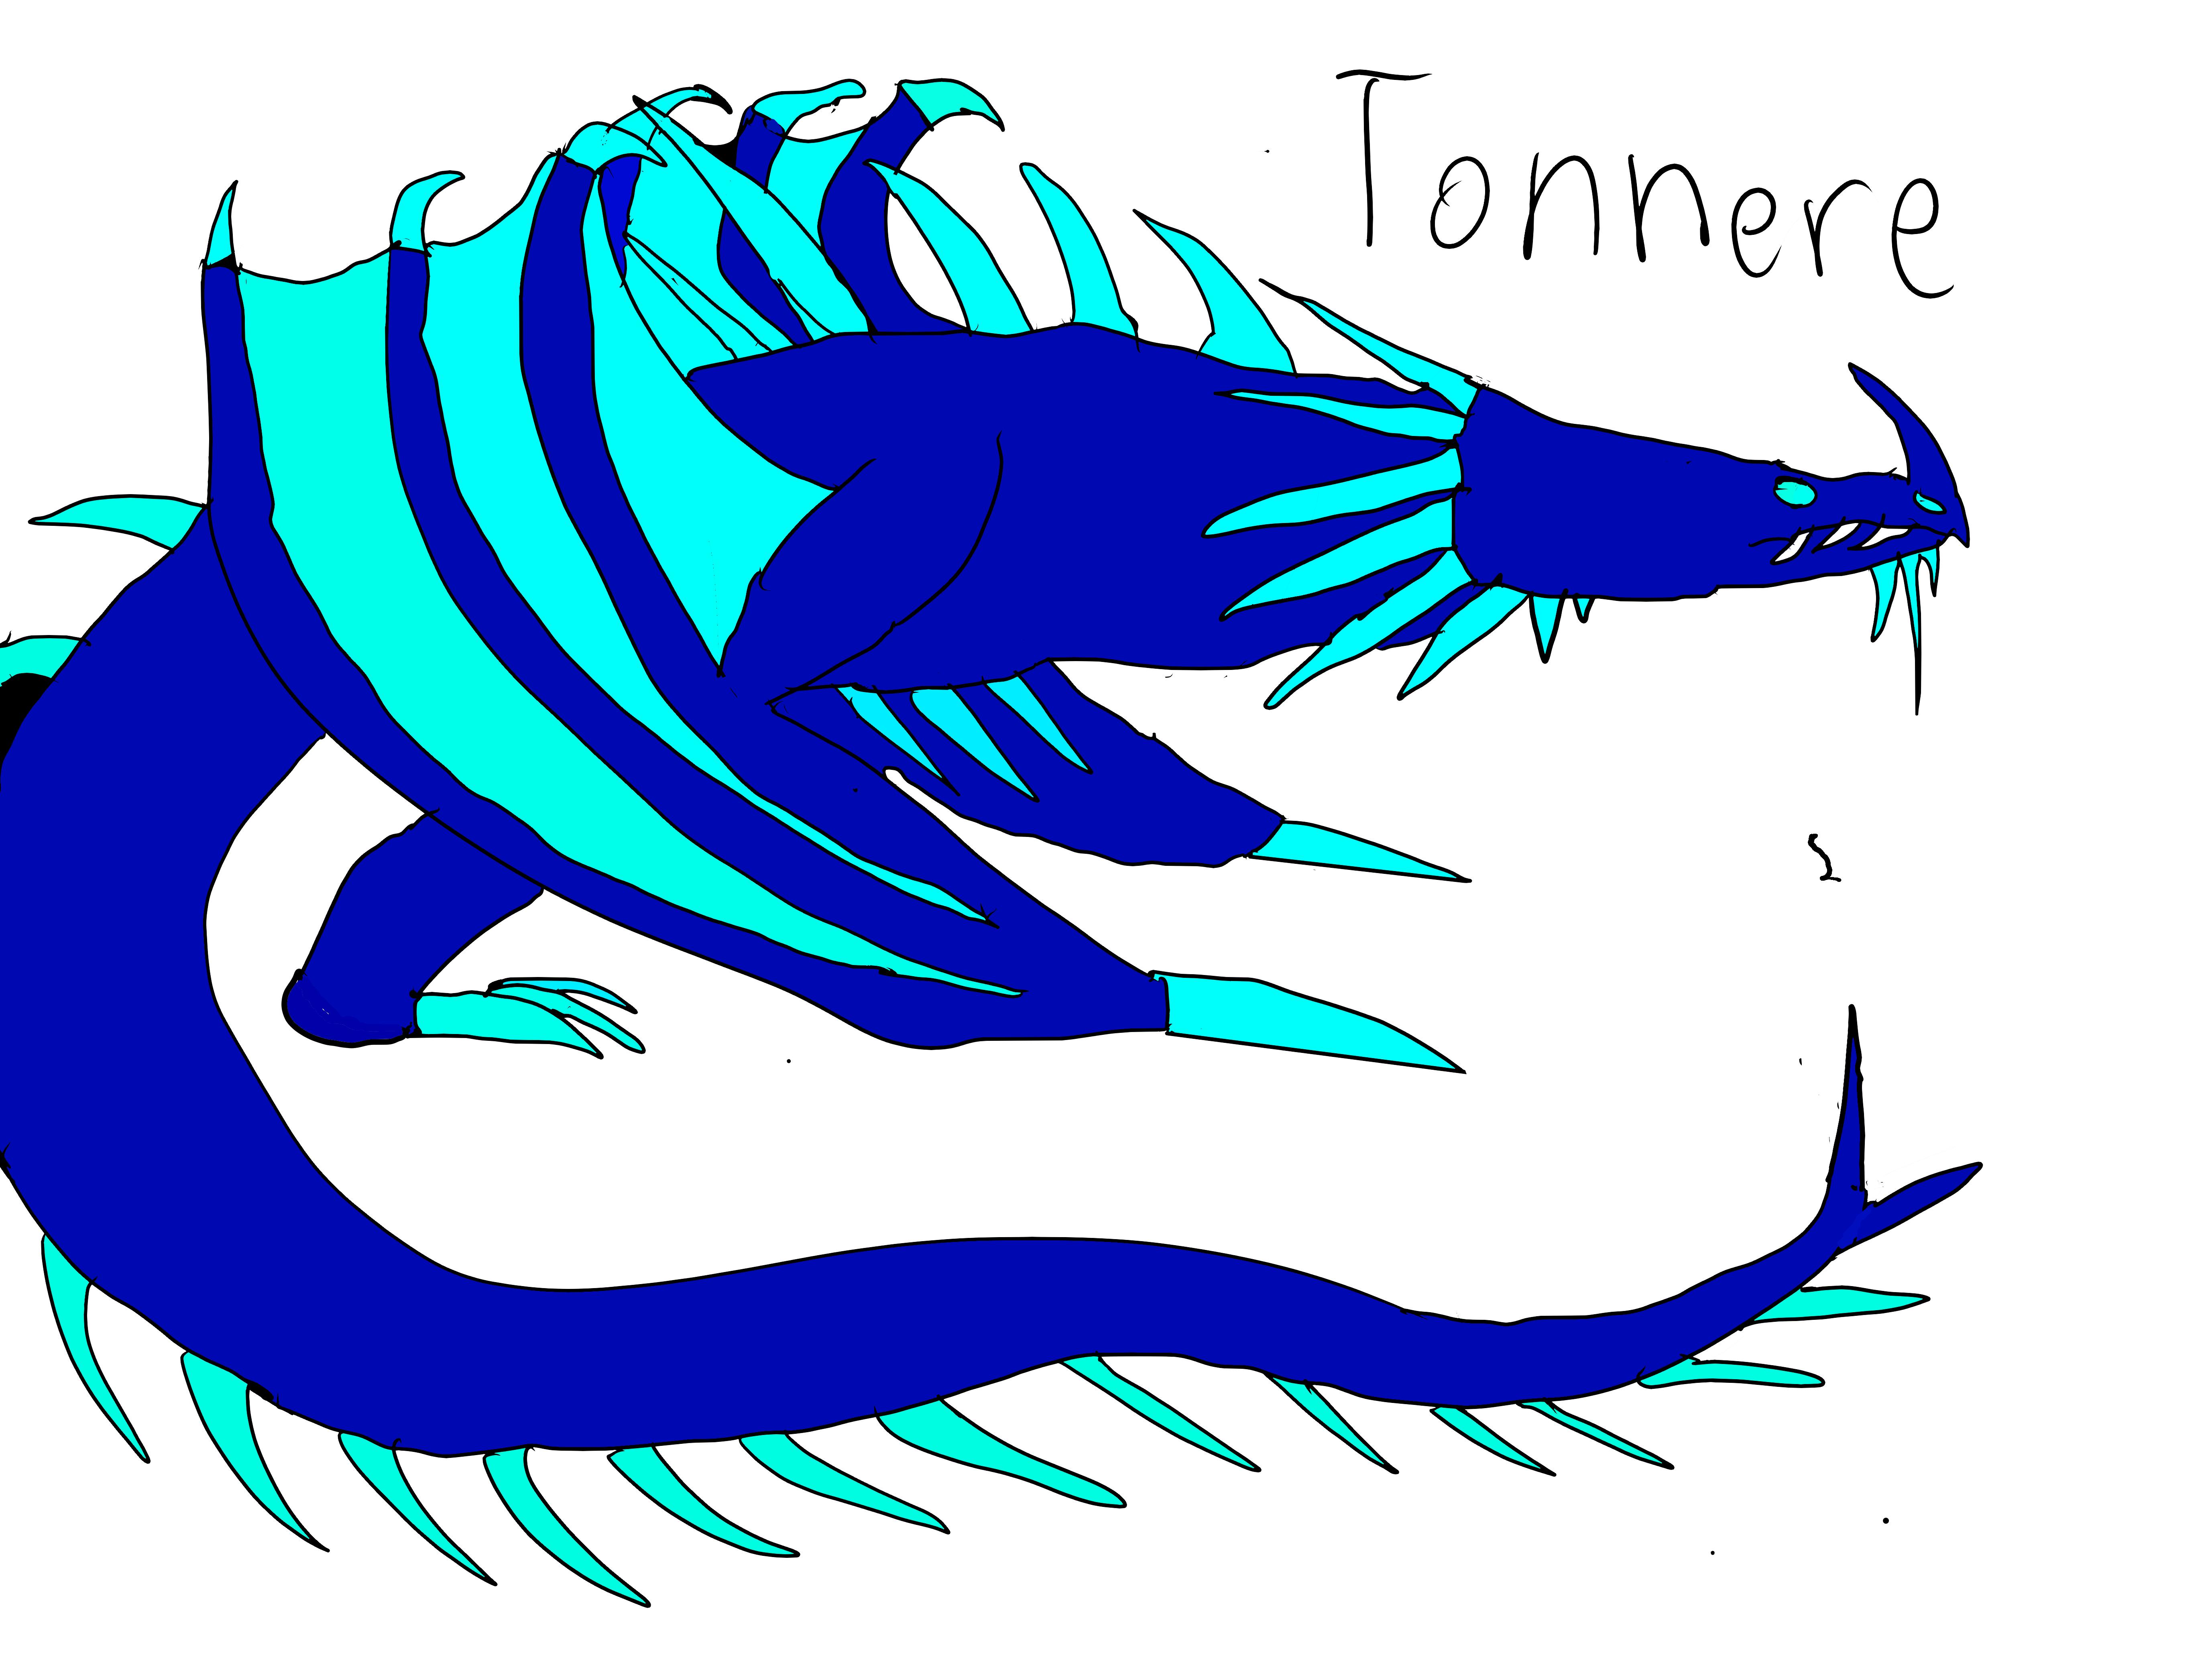 Tonnere